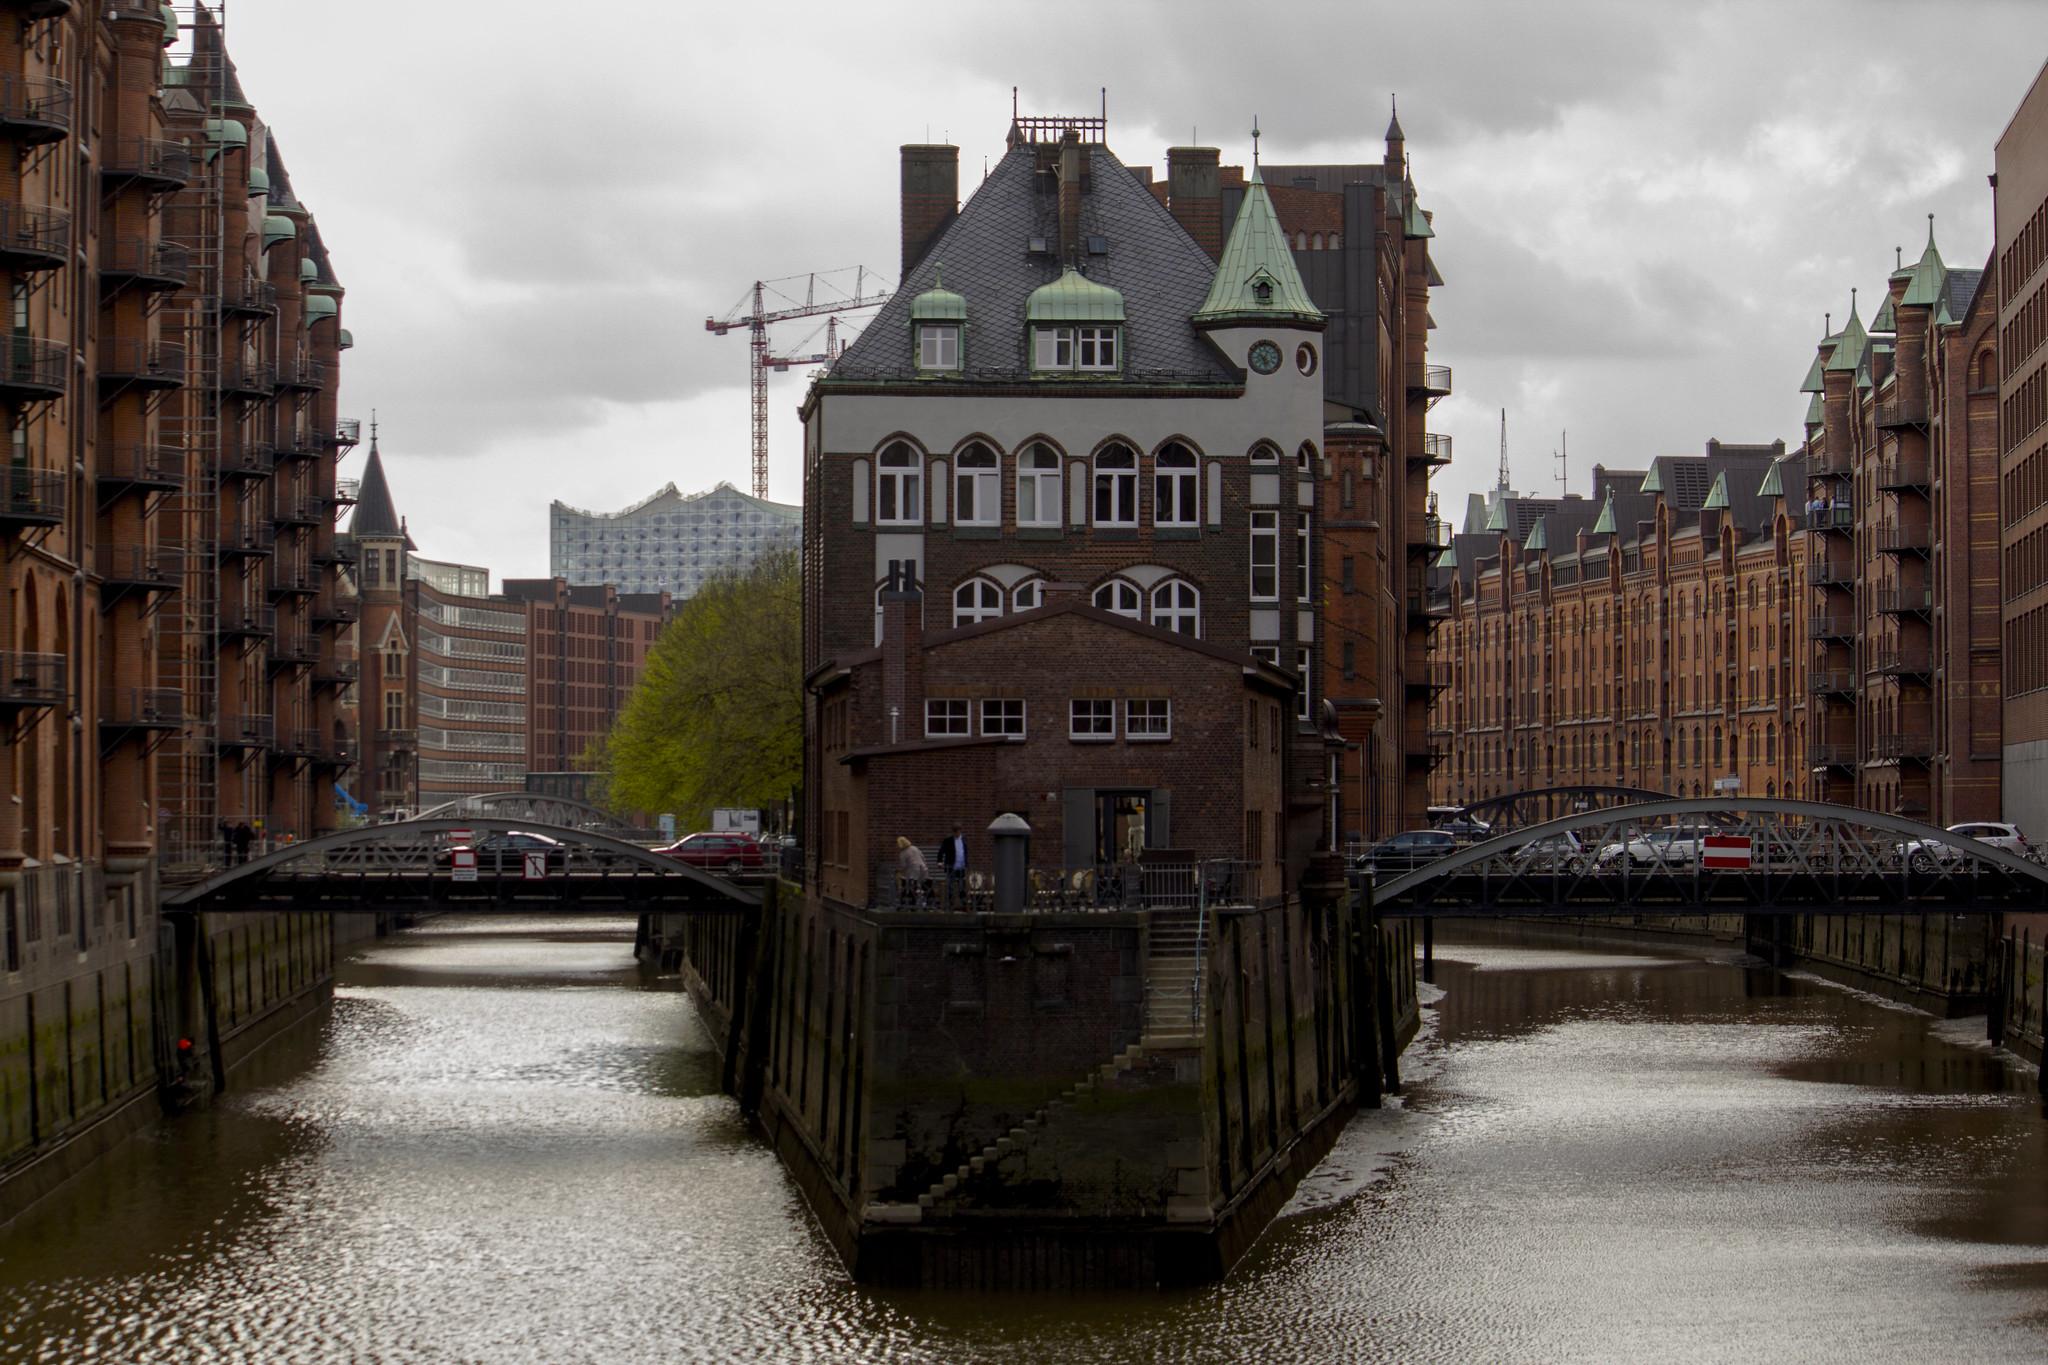 speichestadt canal close up flickr photo sharing. Black Bedroom Furniture Sets. Home Design Ideas